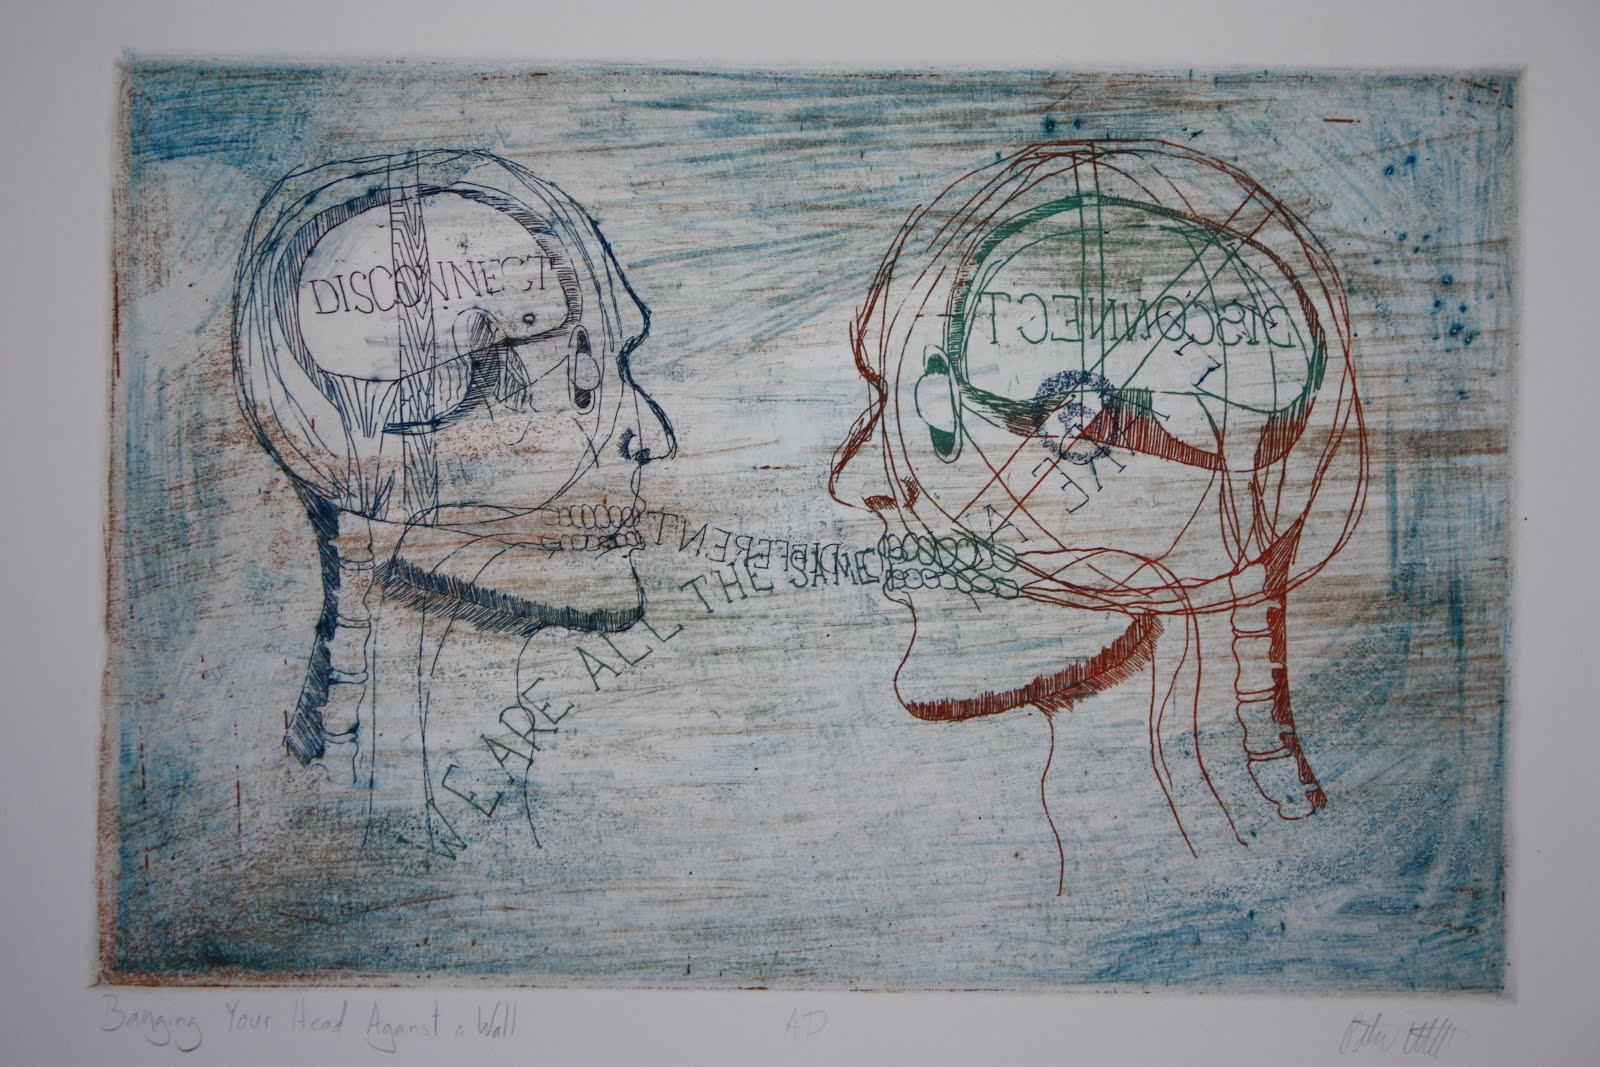 The Art of Patrick Wilkins